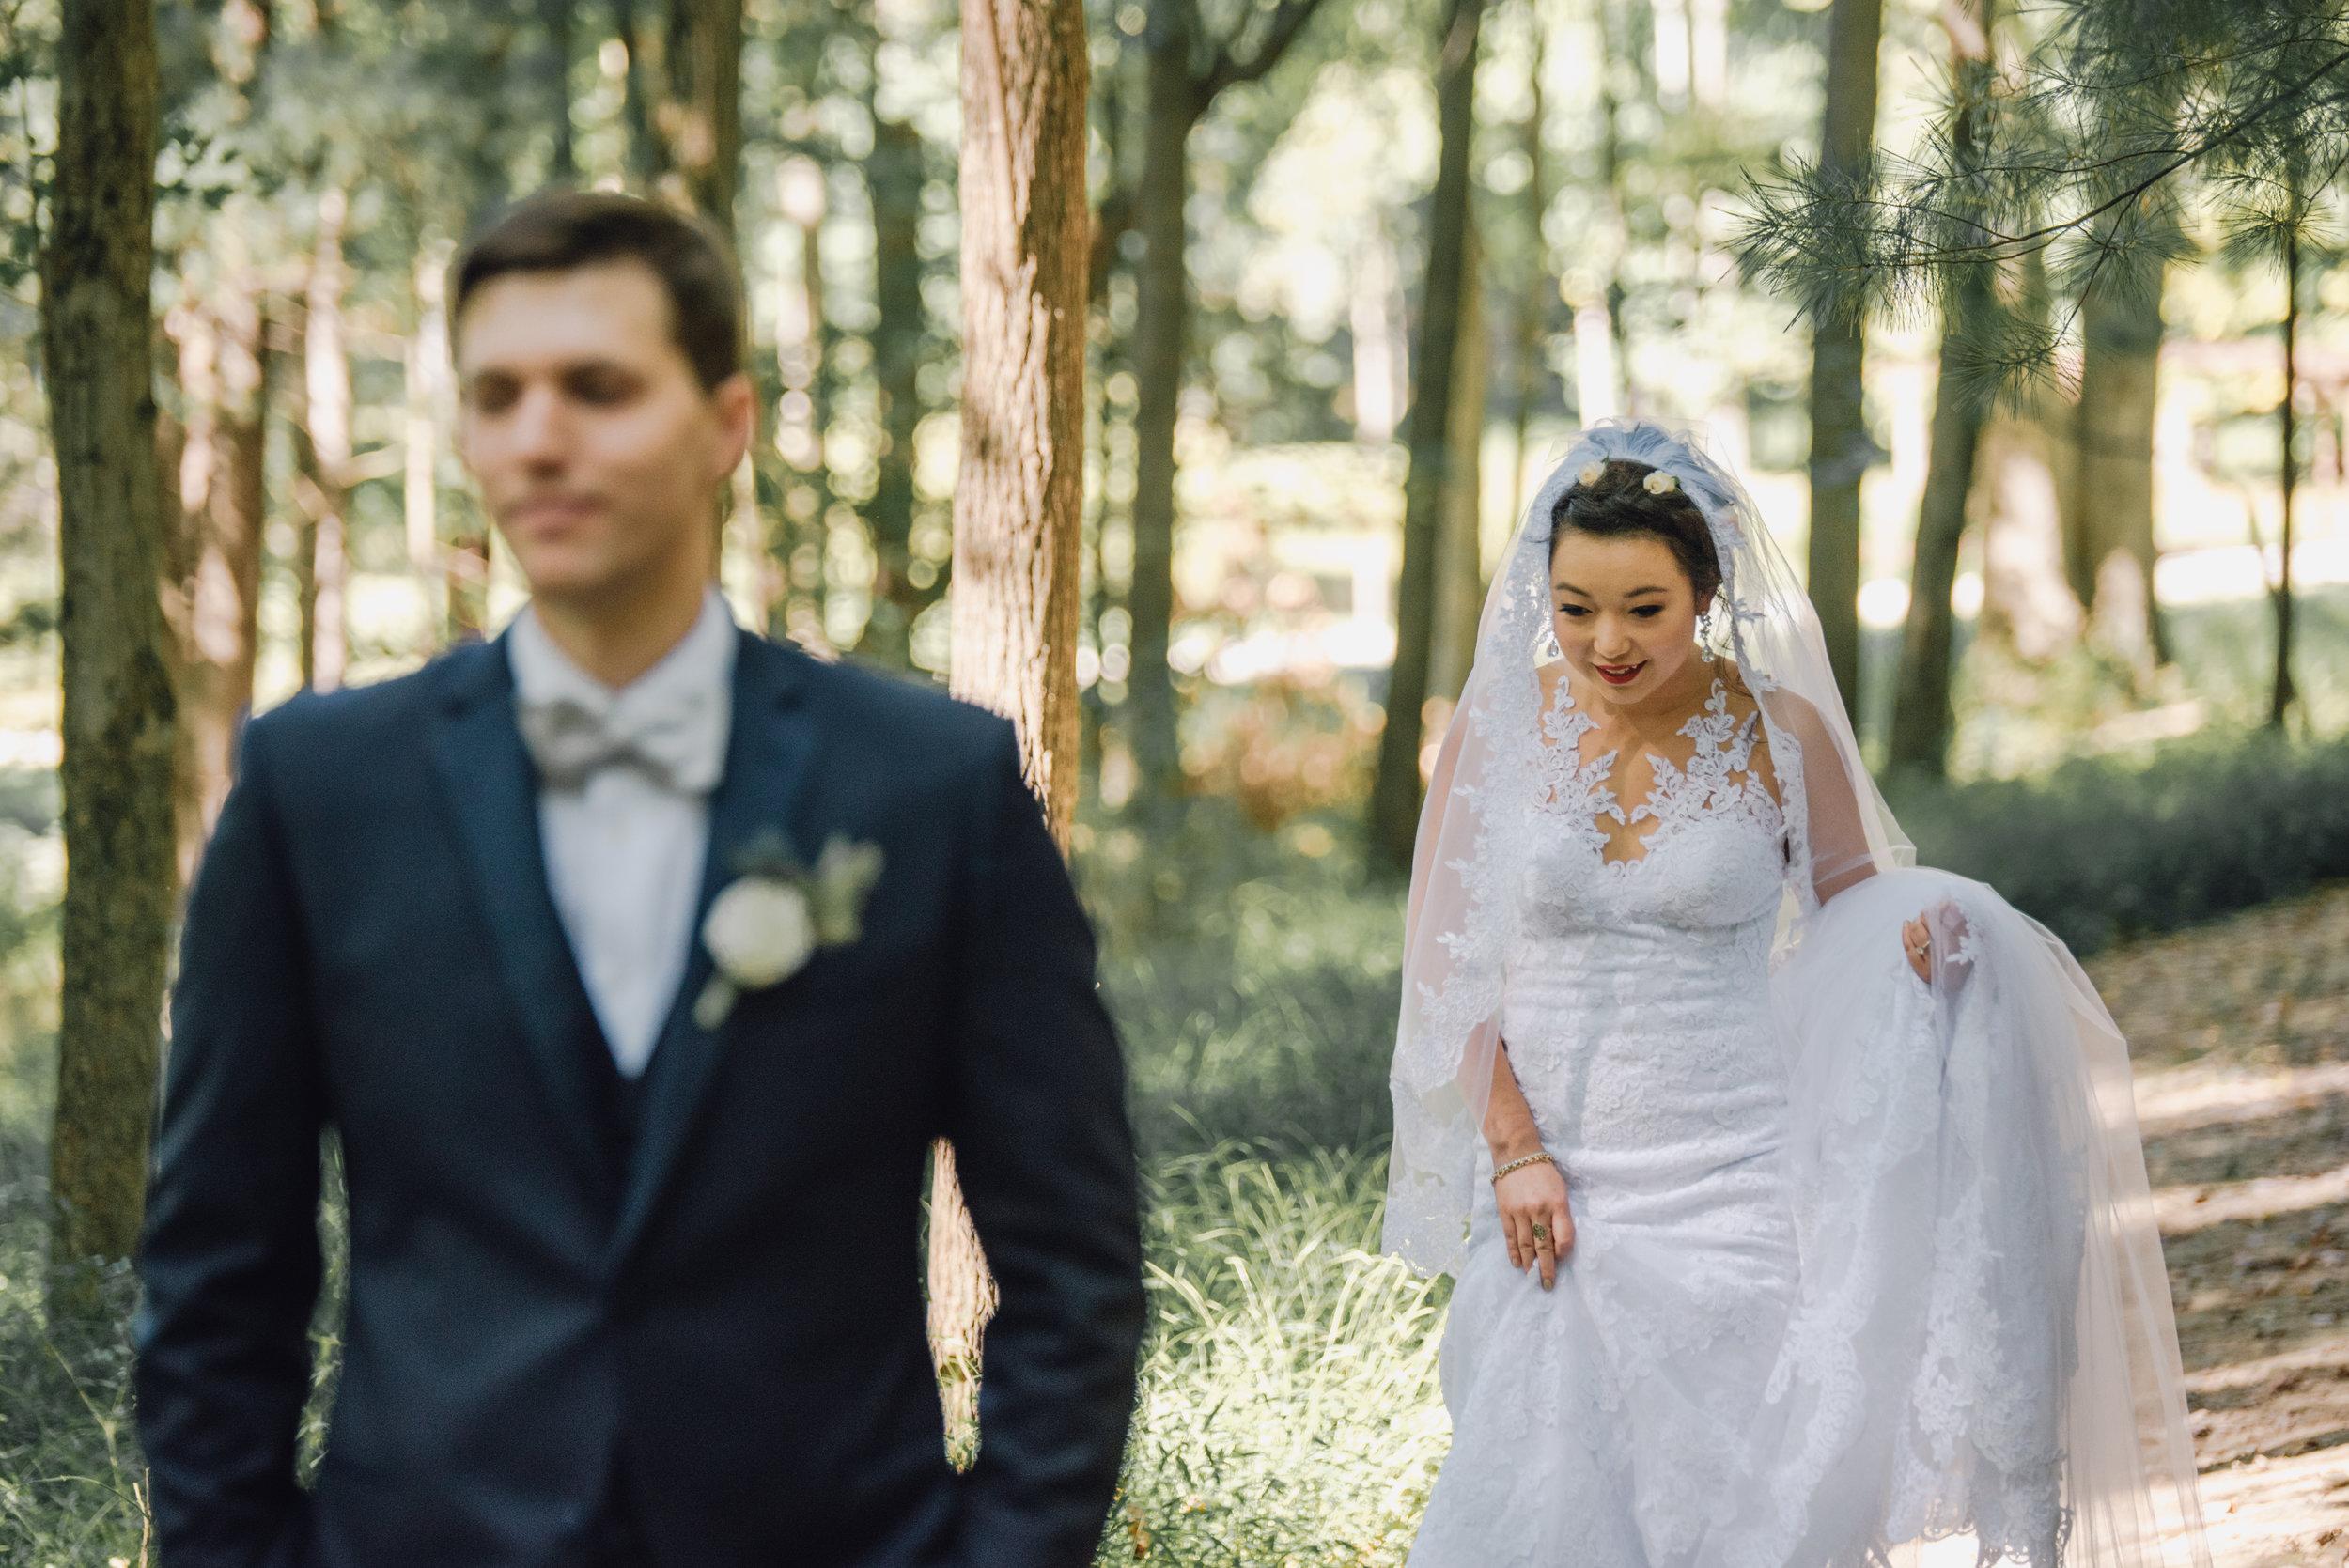 Main and Simple Photography_2016_Wedding_Glenmont_K+C_BLOG-1.jpg